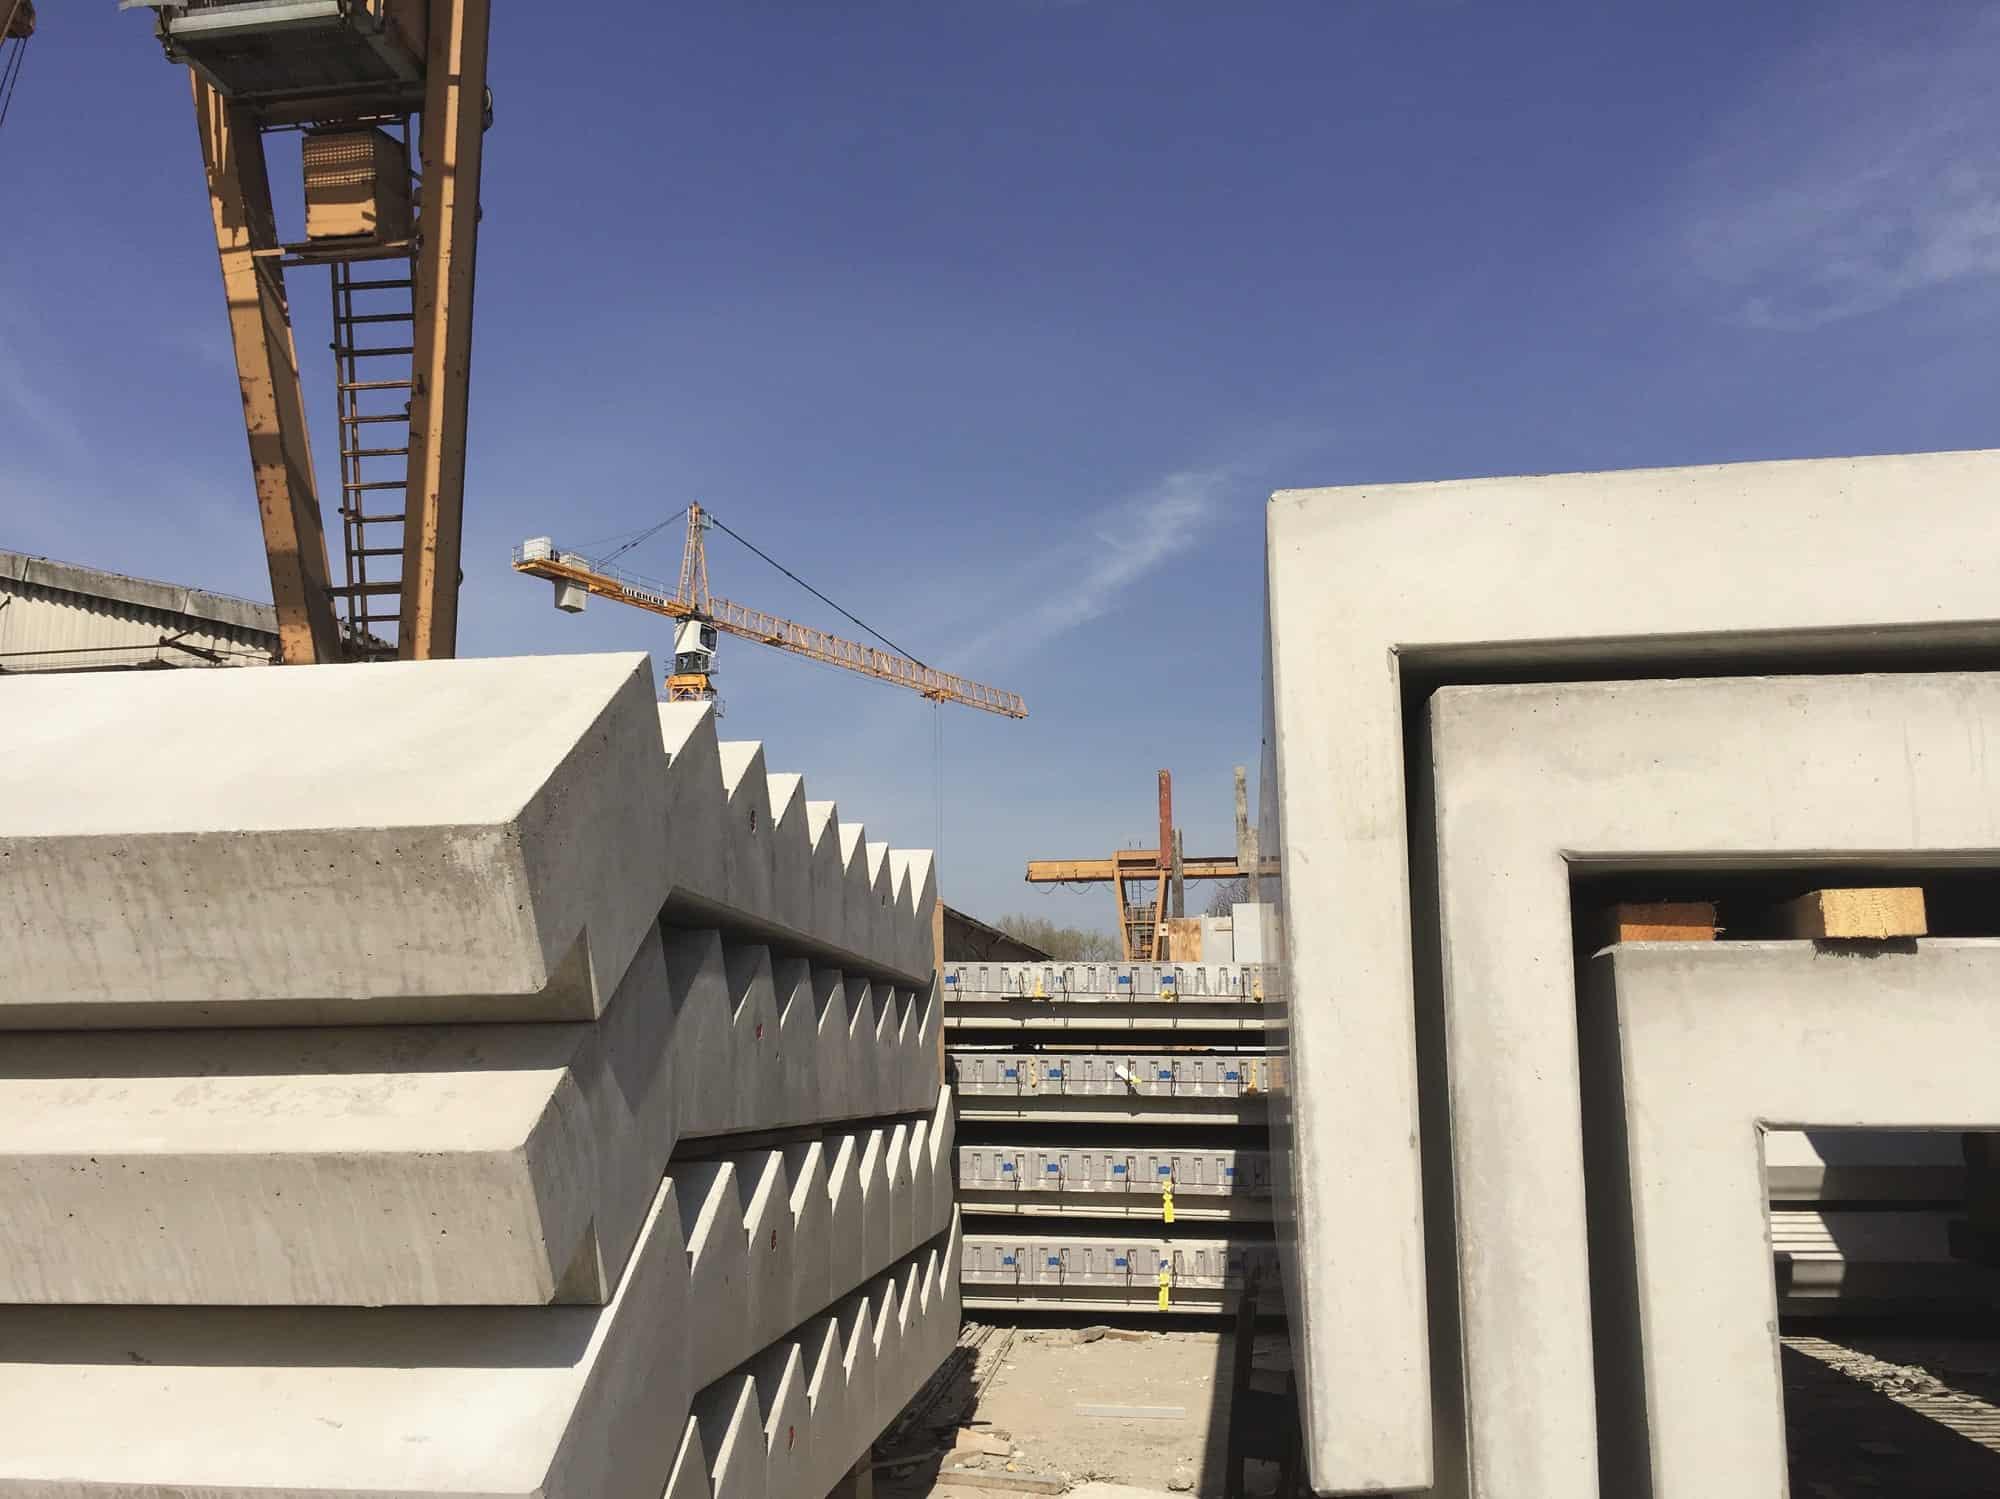 Gelagerte Betonelemente - Betonwerk Spittwitz